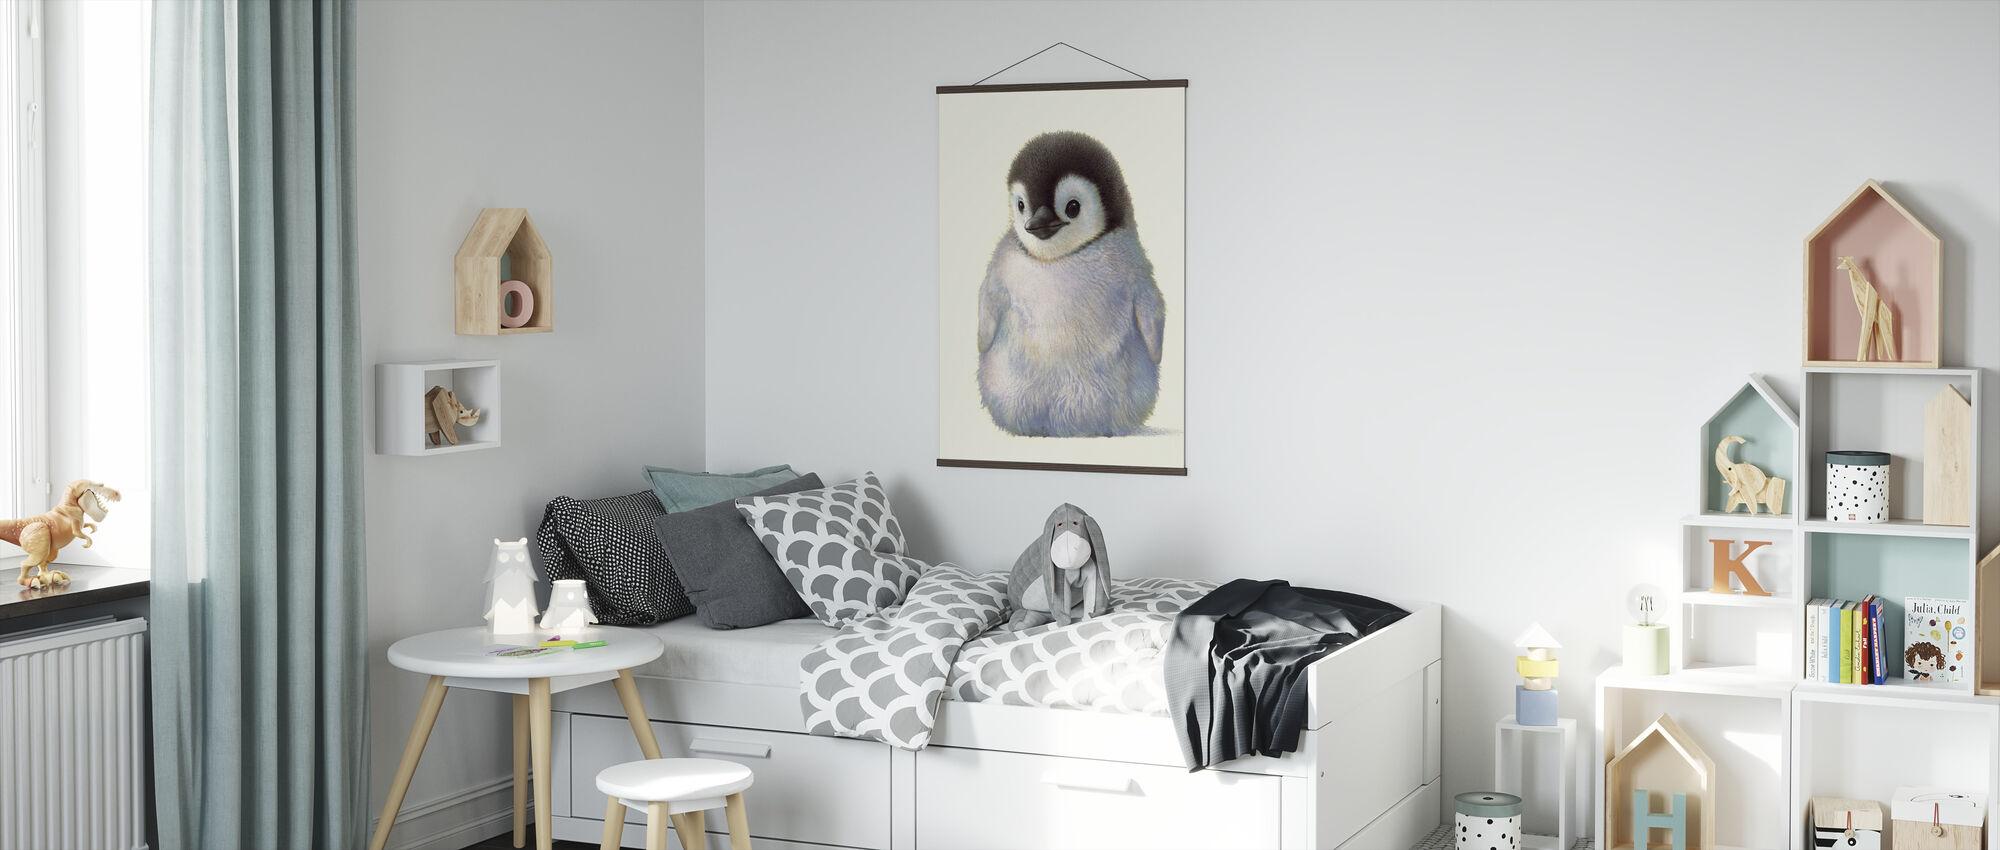 Penguin Chick - Poster - Kids Room